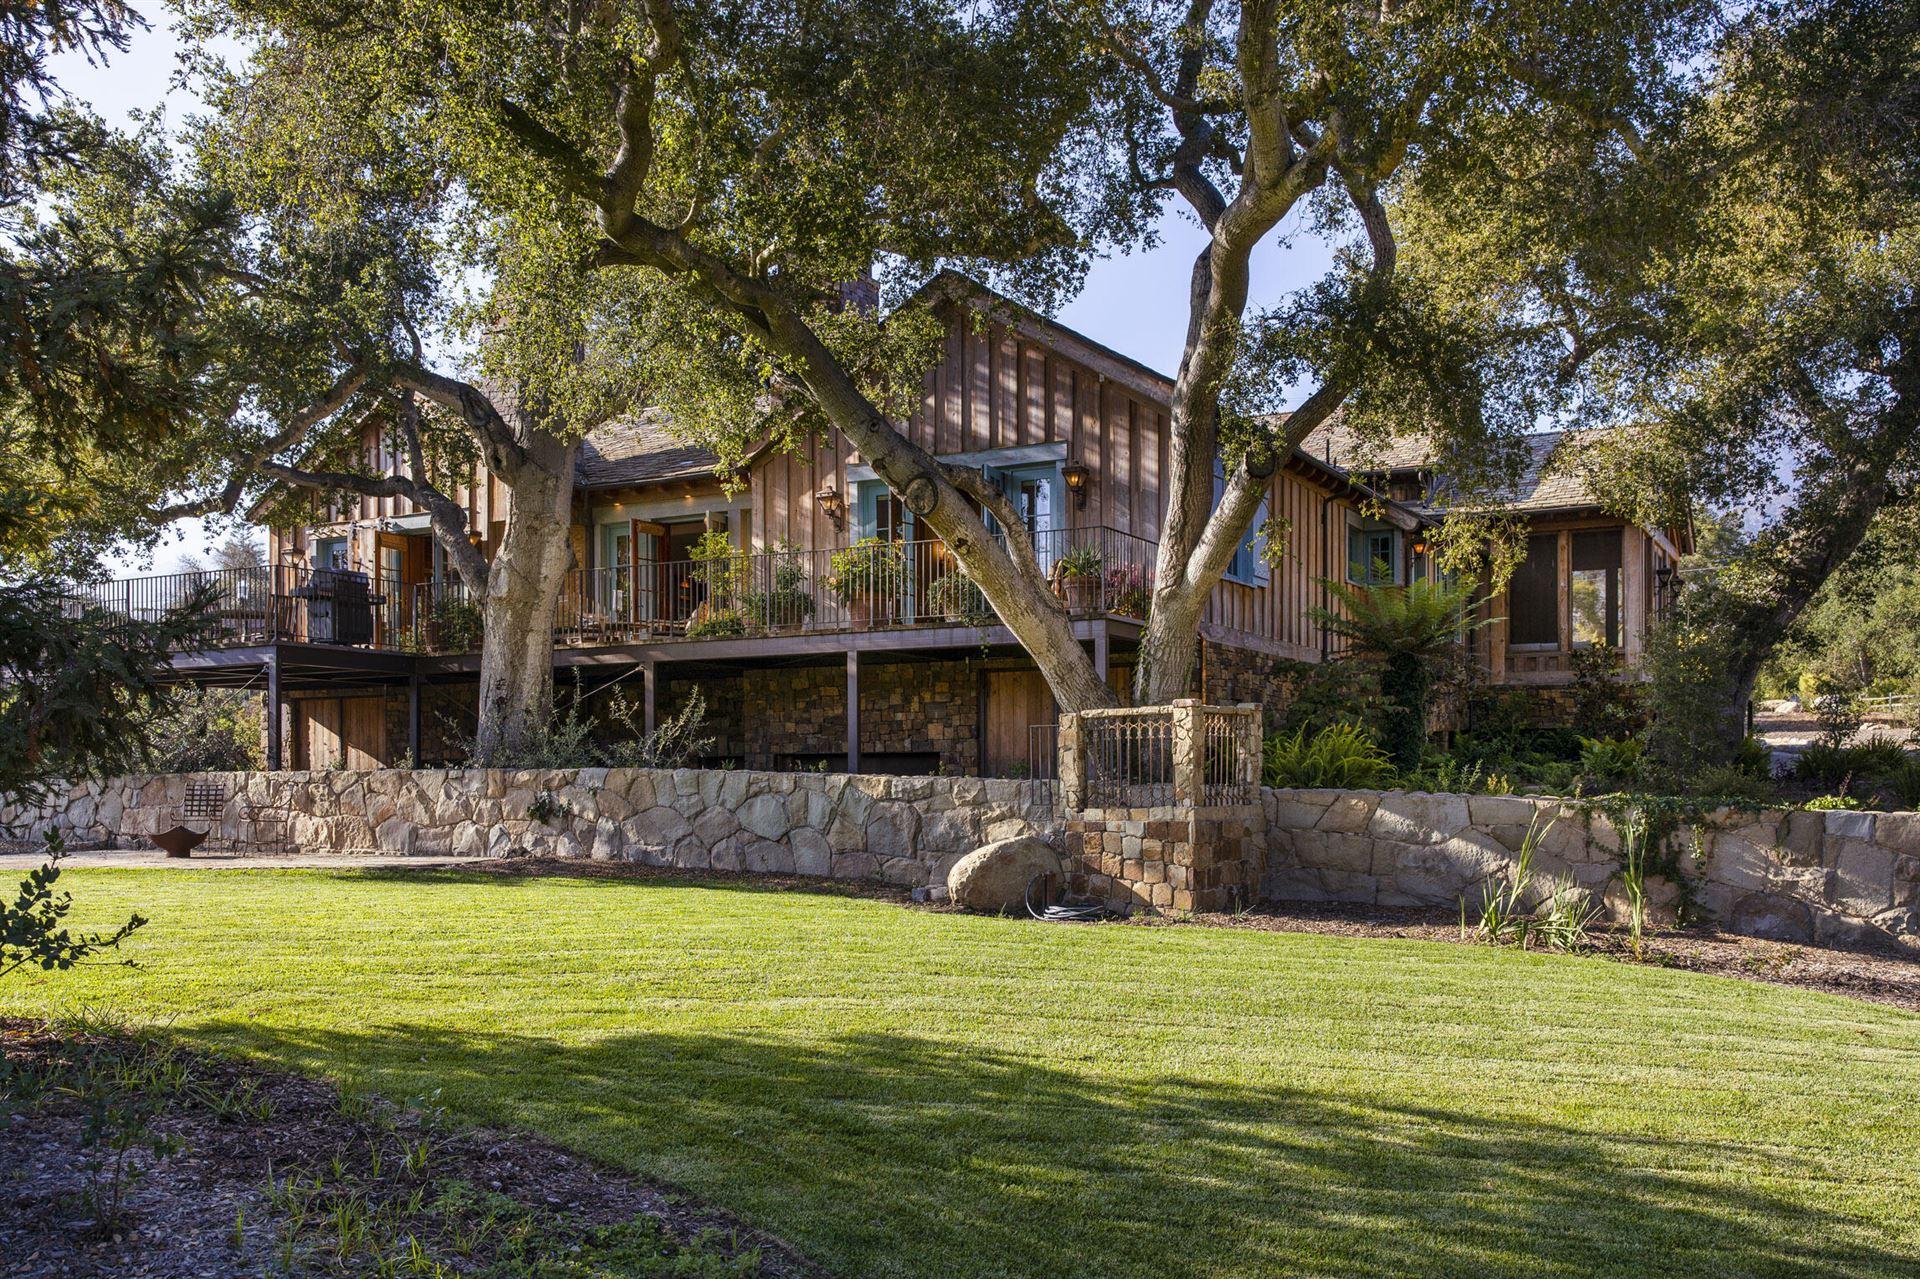 1780 Glen Oaks Dr, Montecito, CA 93108 - MLS#: 21-3364